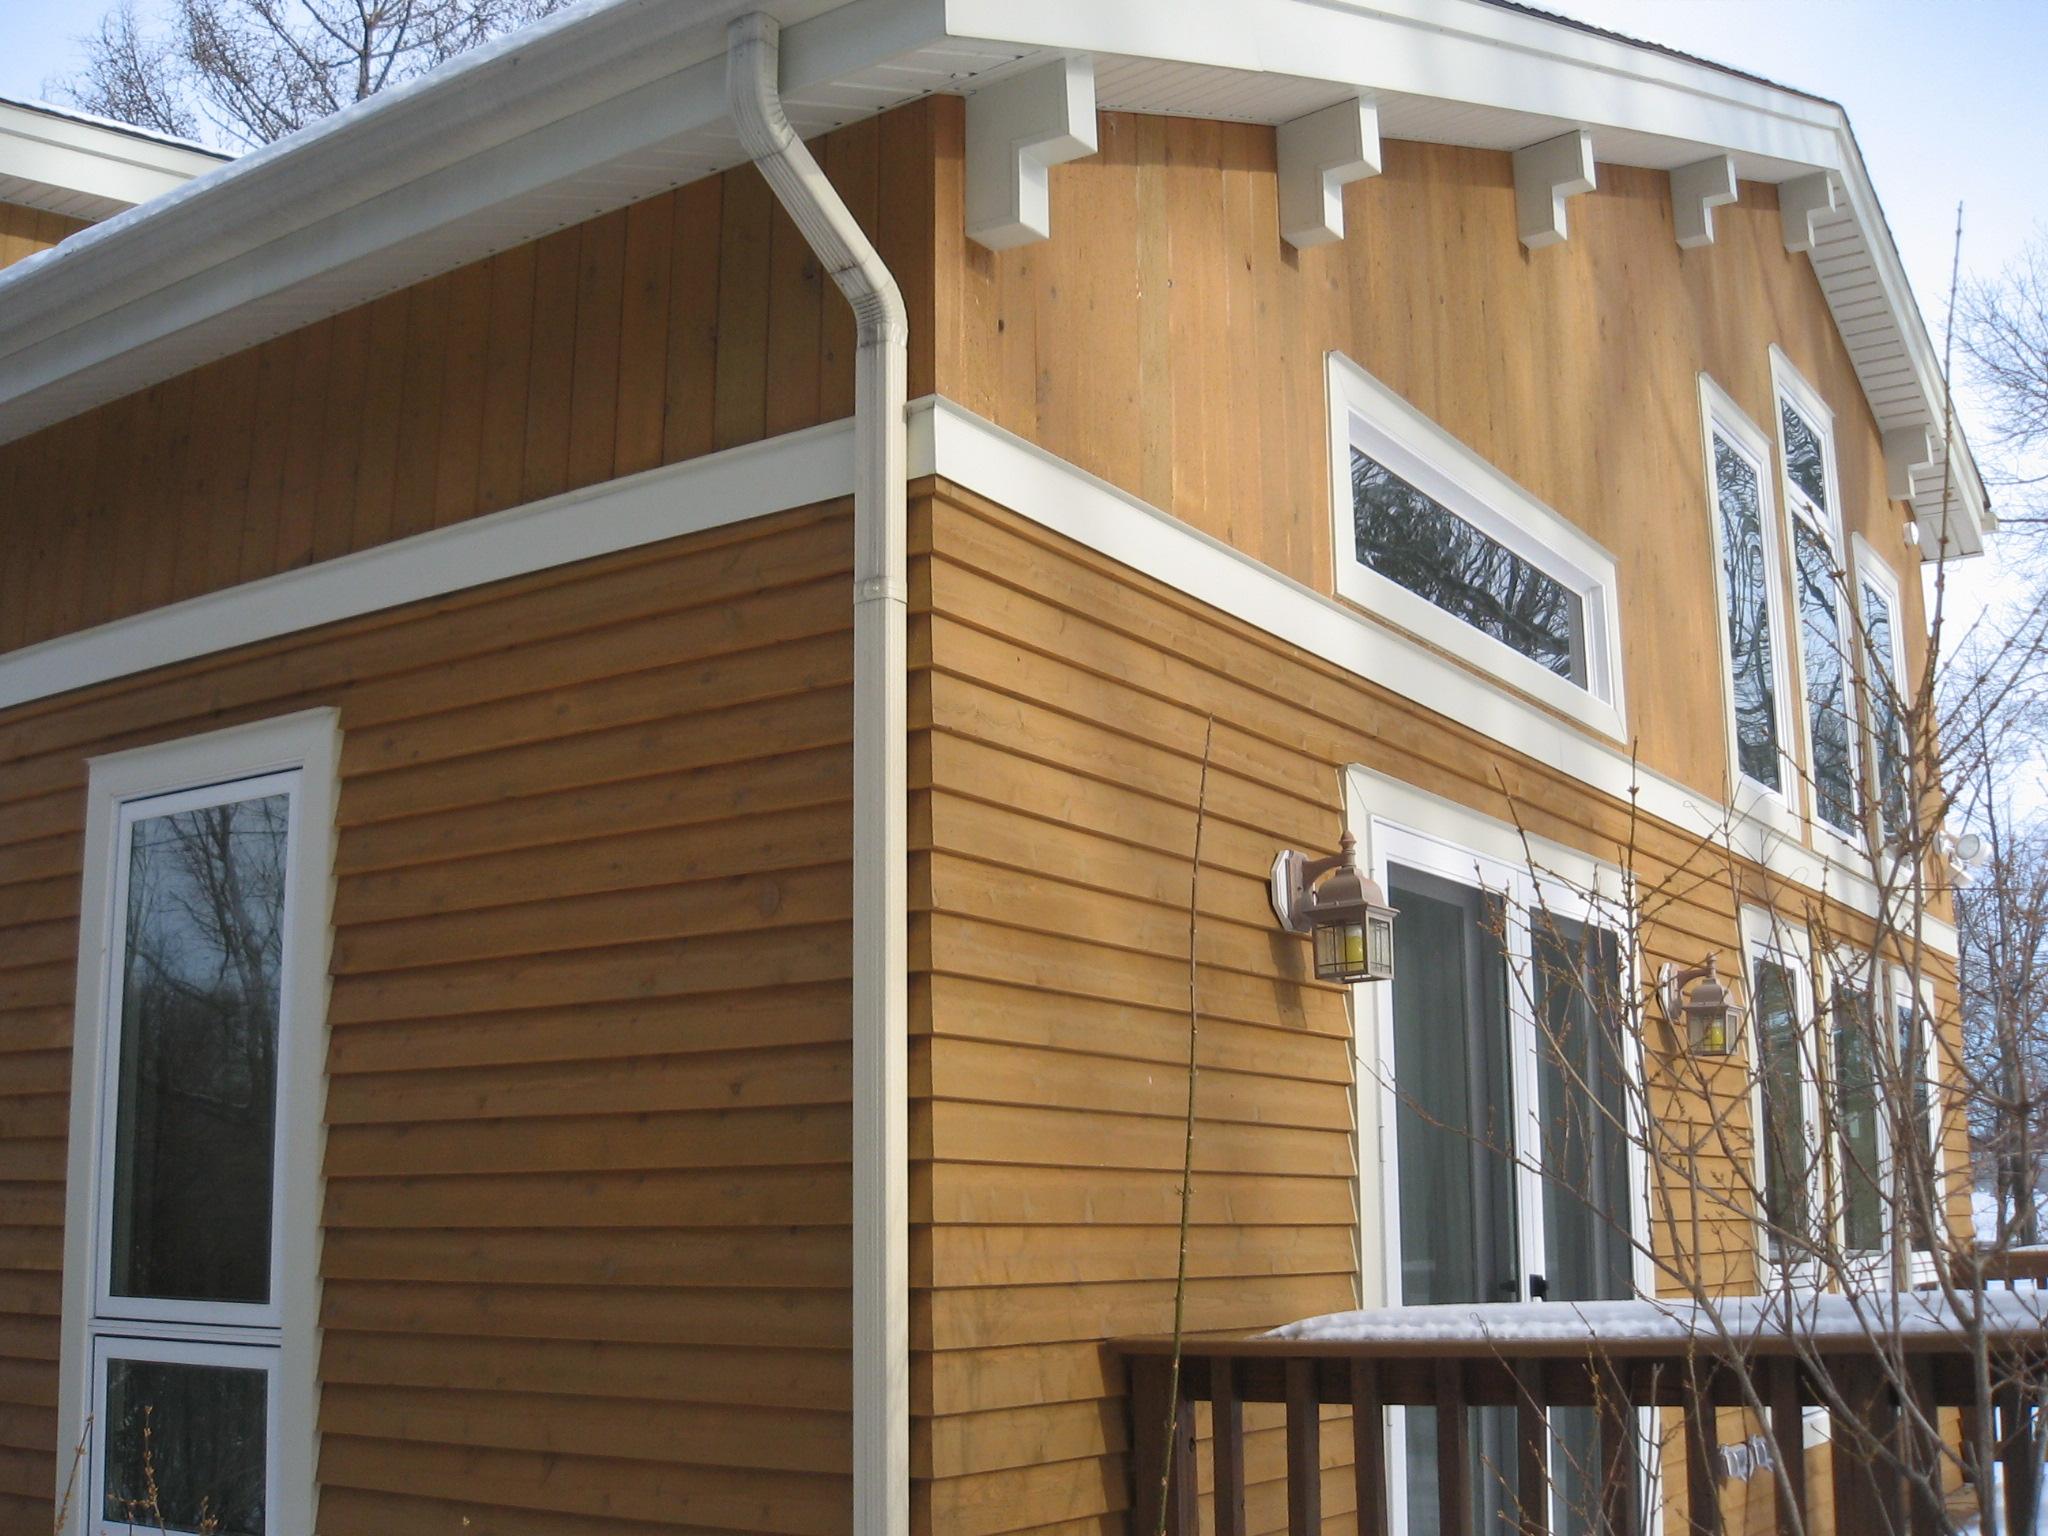 Bevelled Siding Divider Angle Windows Siding And Doors